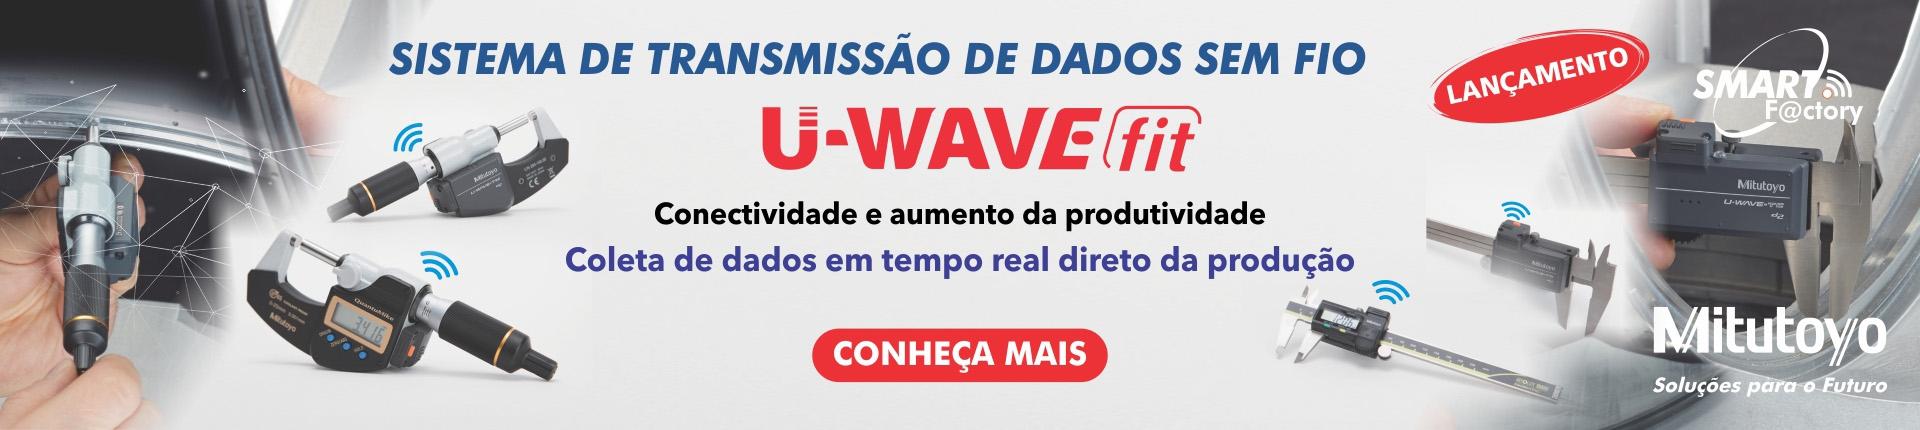 U-wave